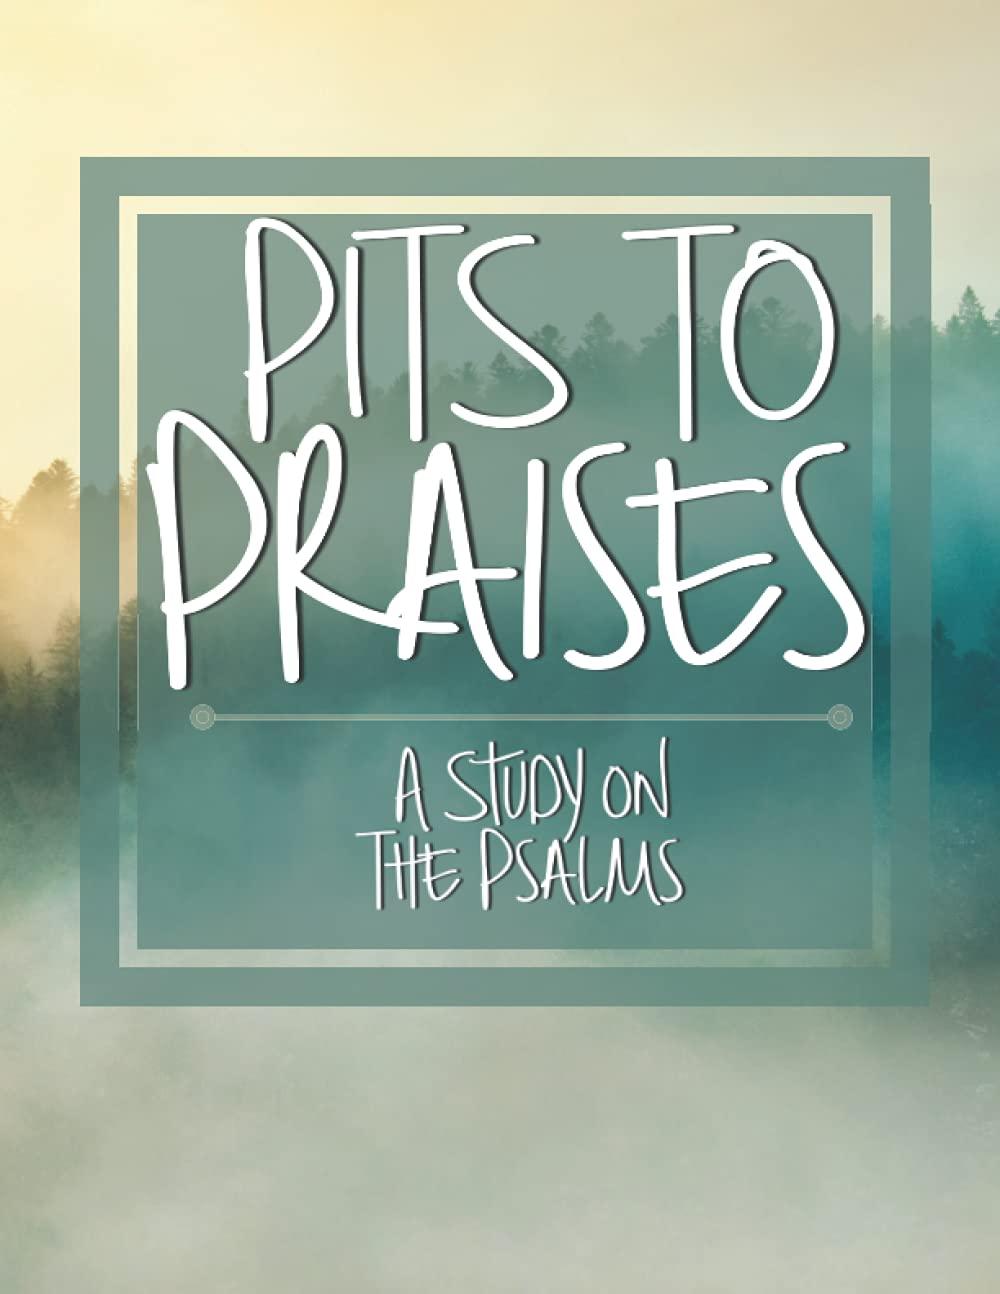 Pits to Praises: A Study of the Psalms: Marlowe, Bonnie Hunter, Fleming,  Bethany: 9798743795147: Amazon.com: Books